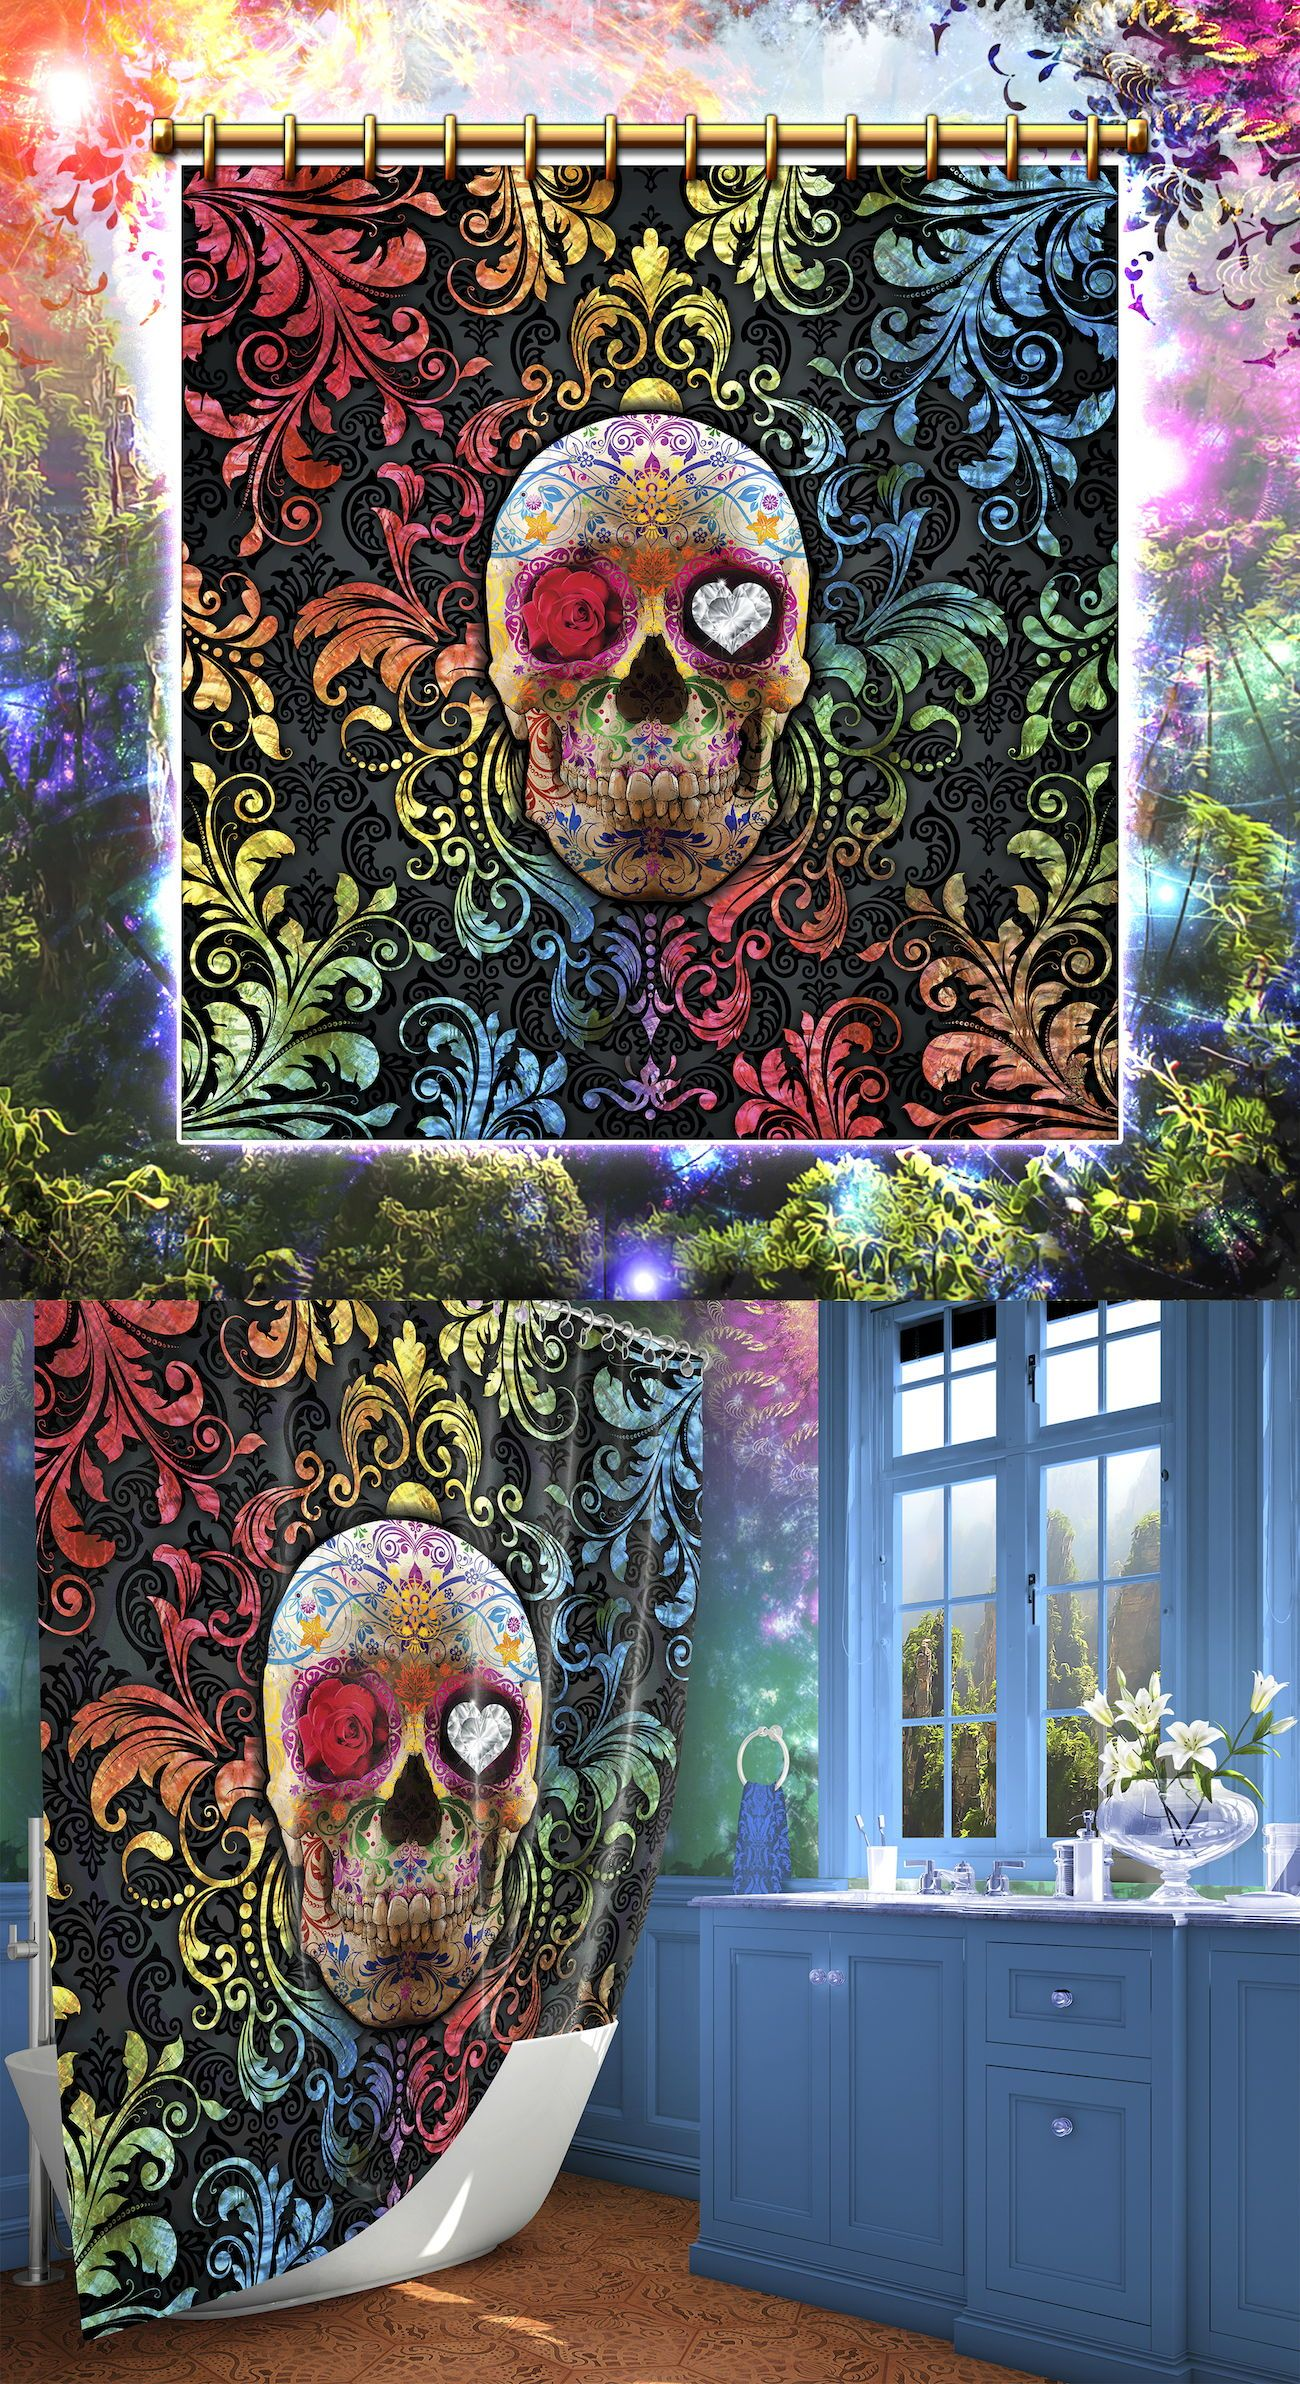 Sugar Skull Shower Curtain Day Of The Dead Decor In 2020 Sugar Skull Shower Curtain Skull Shower Curtain Bathroom Decor Colors